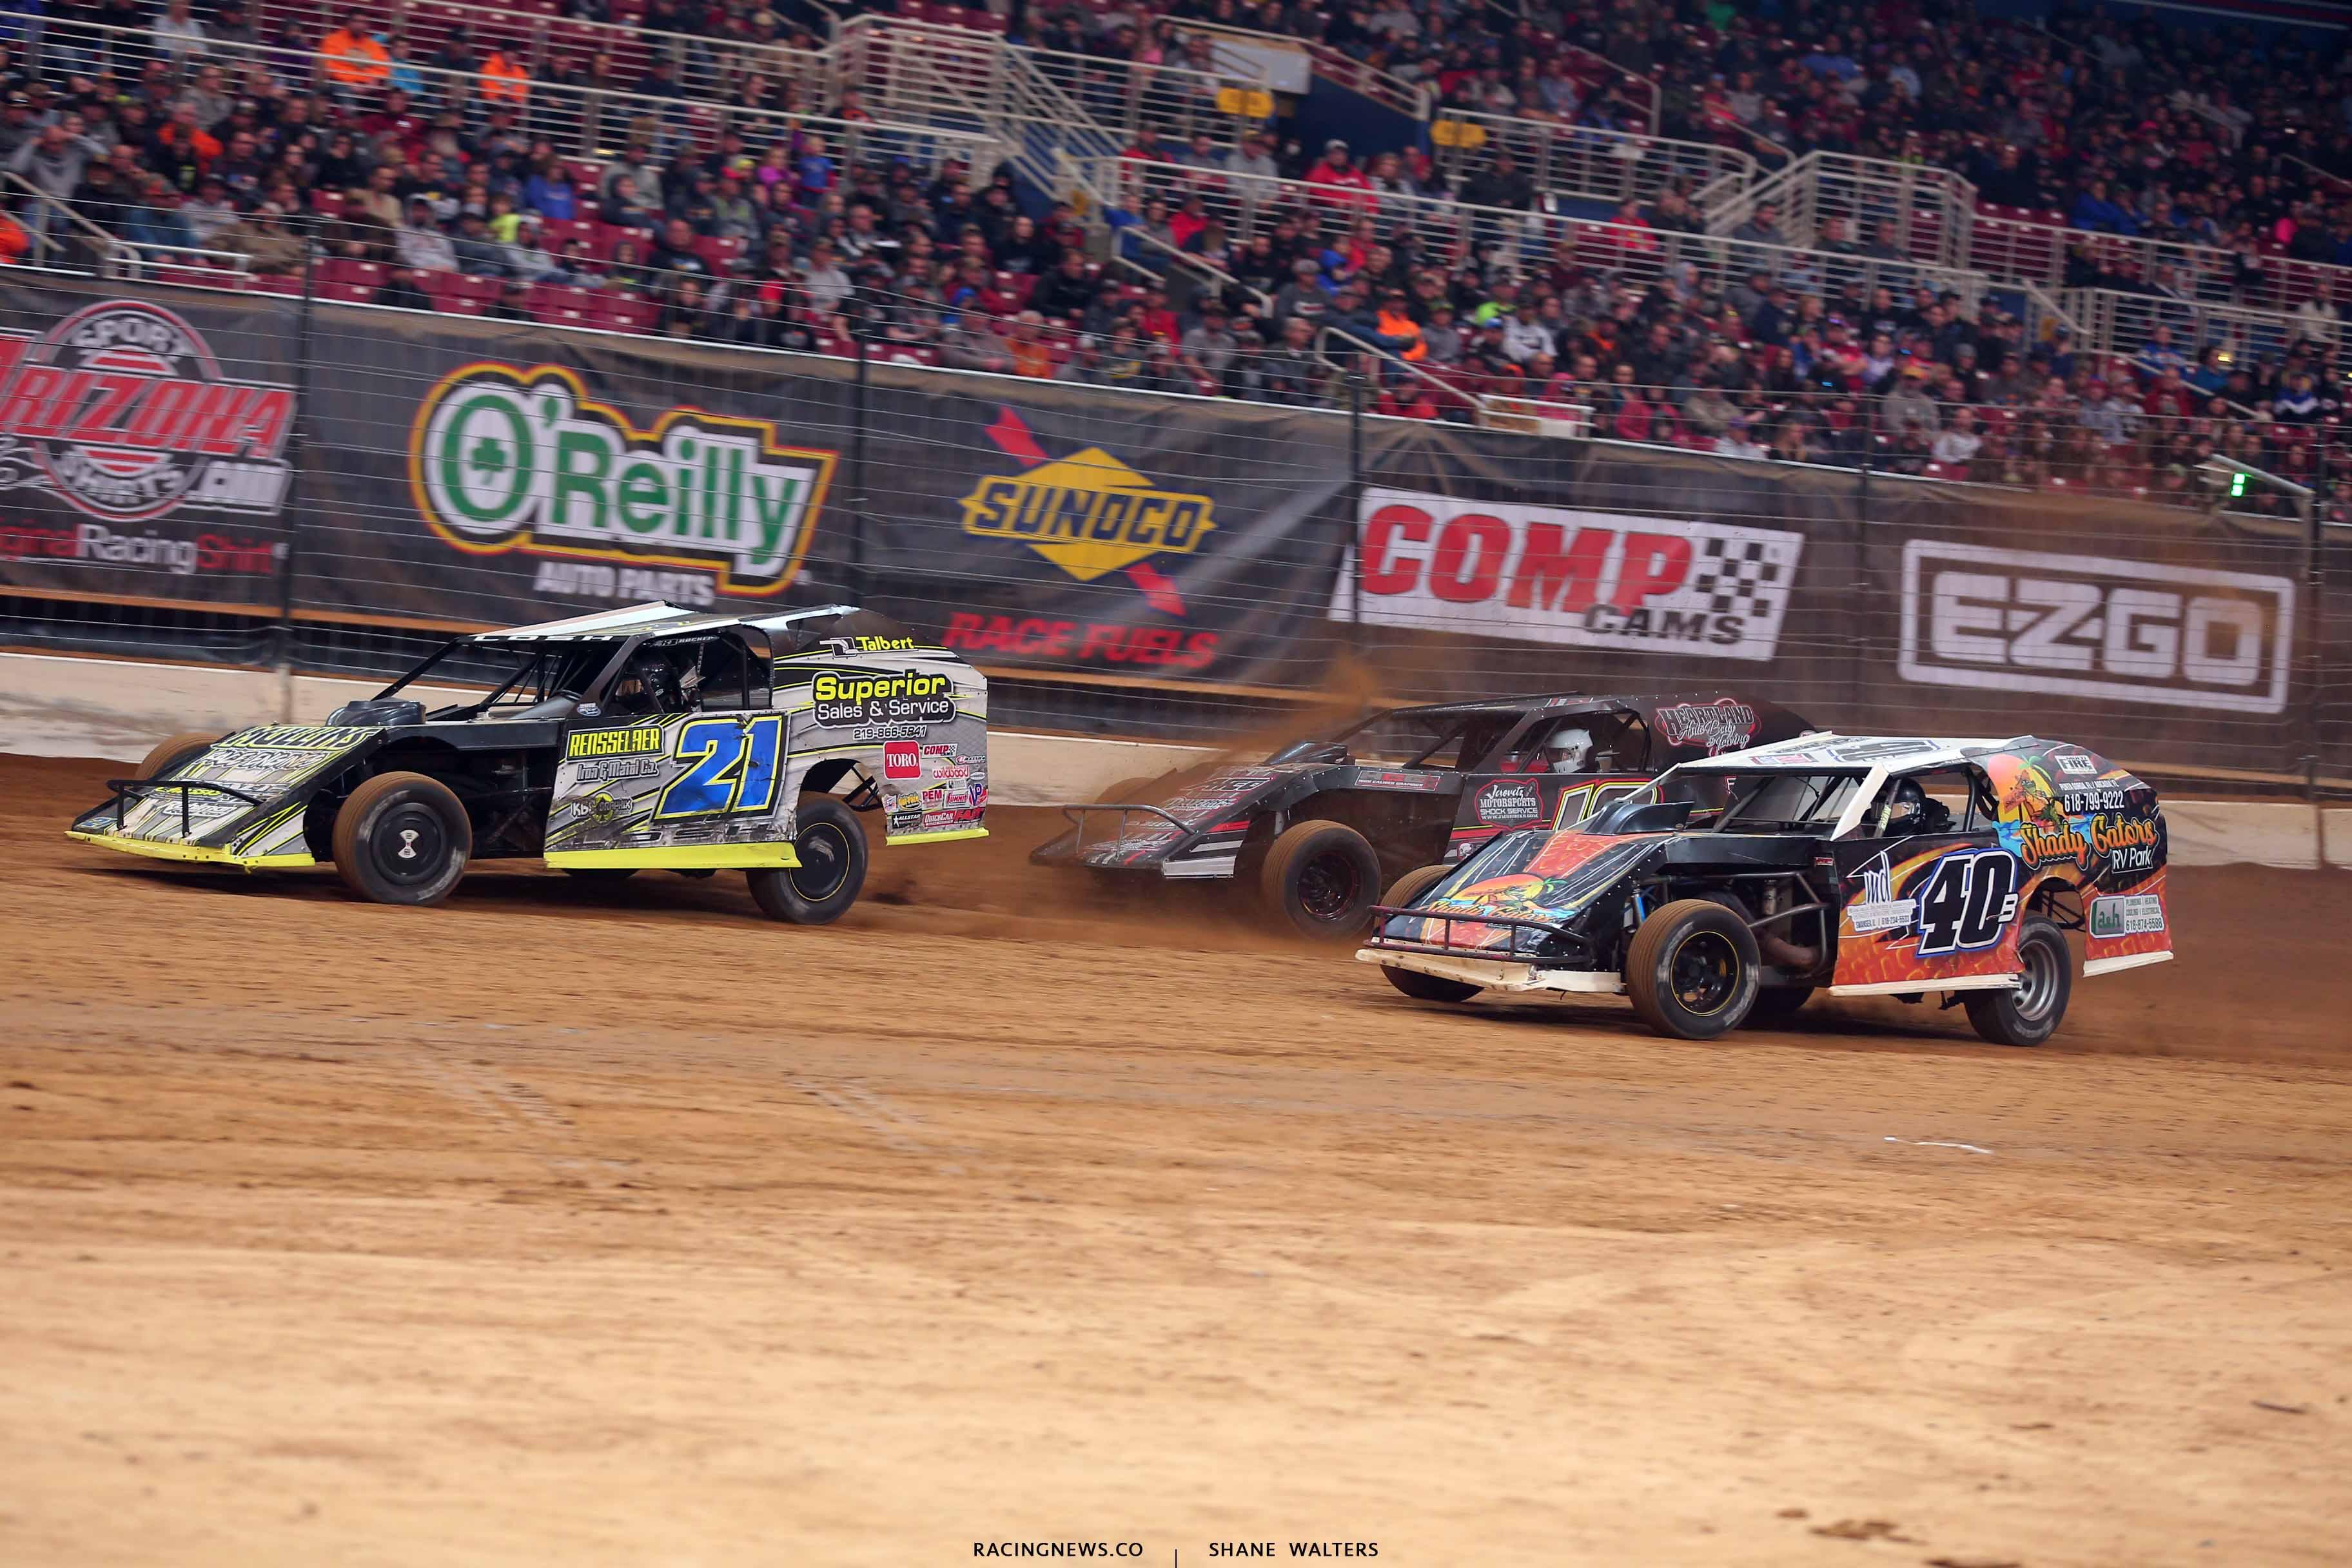 Derek Losh, Kyle Bronson and Michael Long in the Gateway Dirt Nationals - Dirt Modified 2849